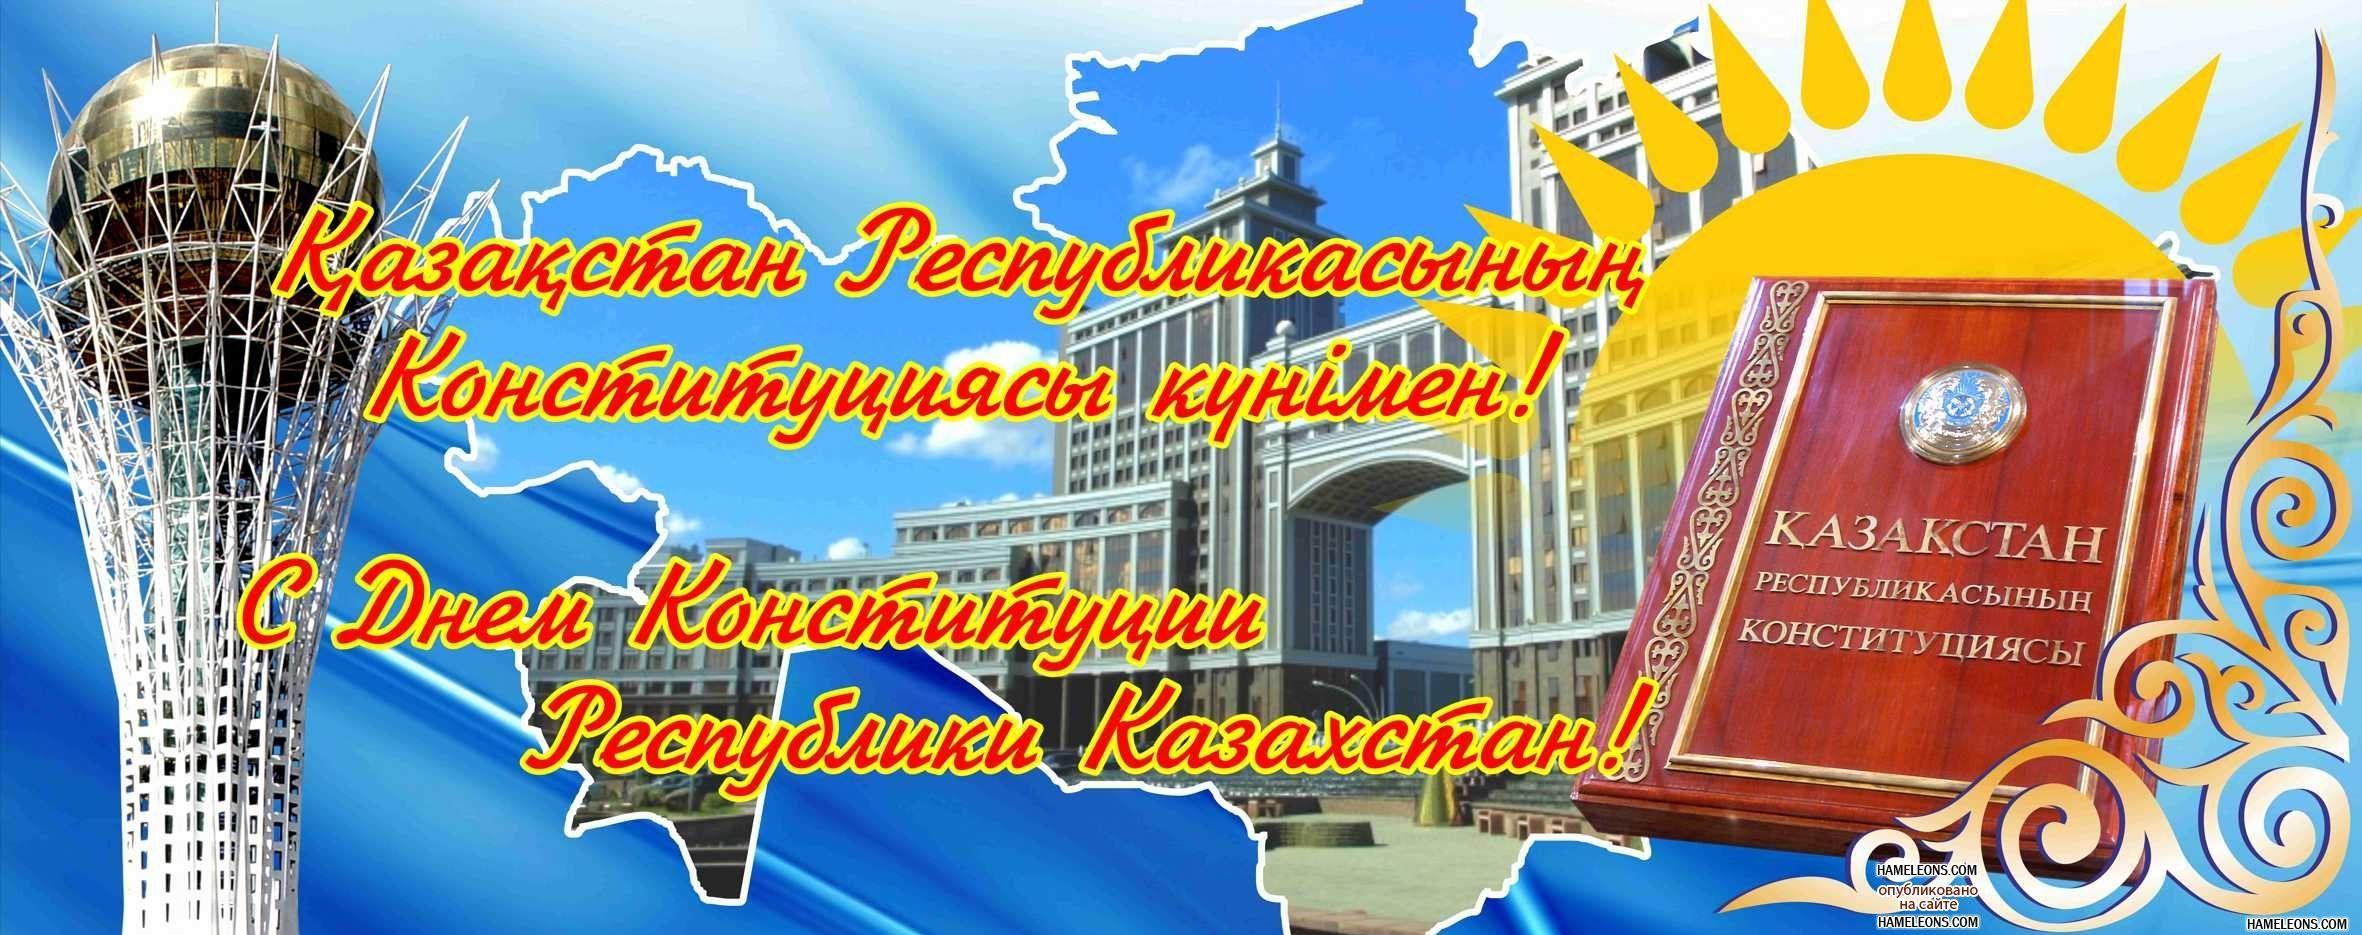 img1989966_konstitutsiya_Kazahstana